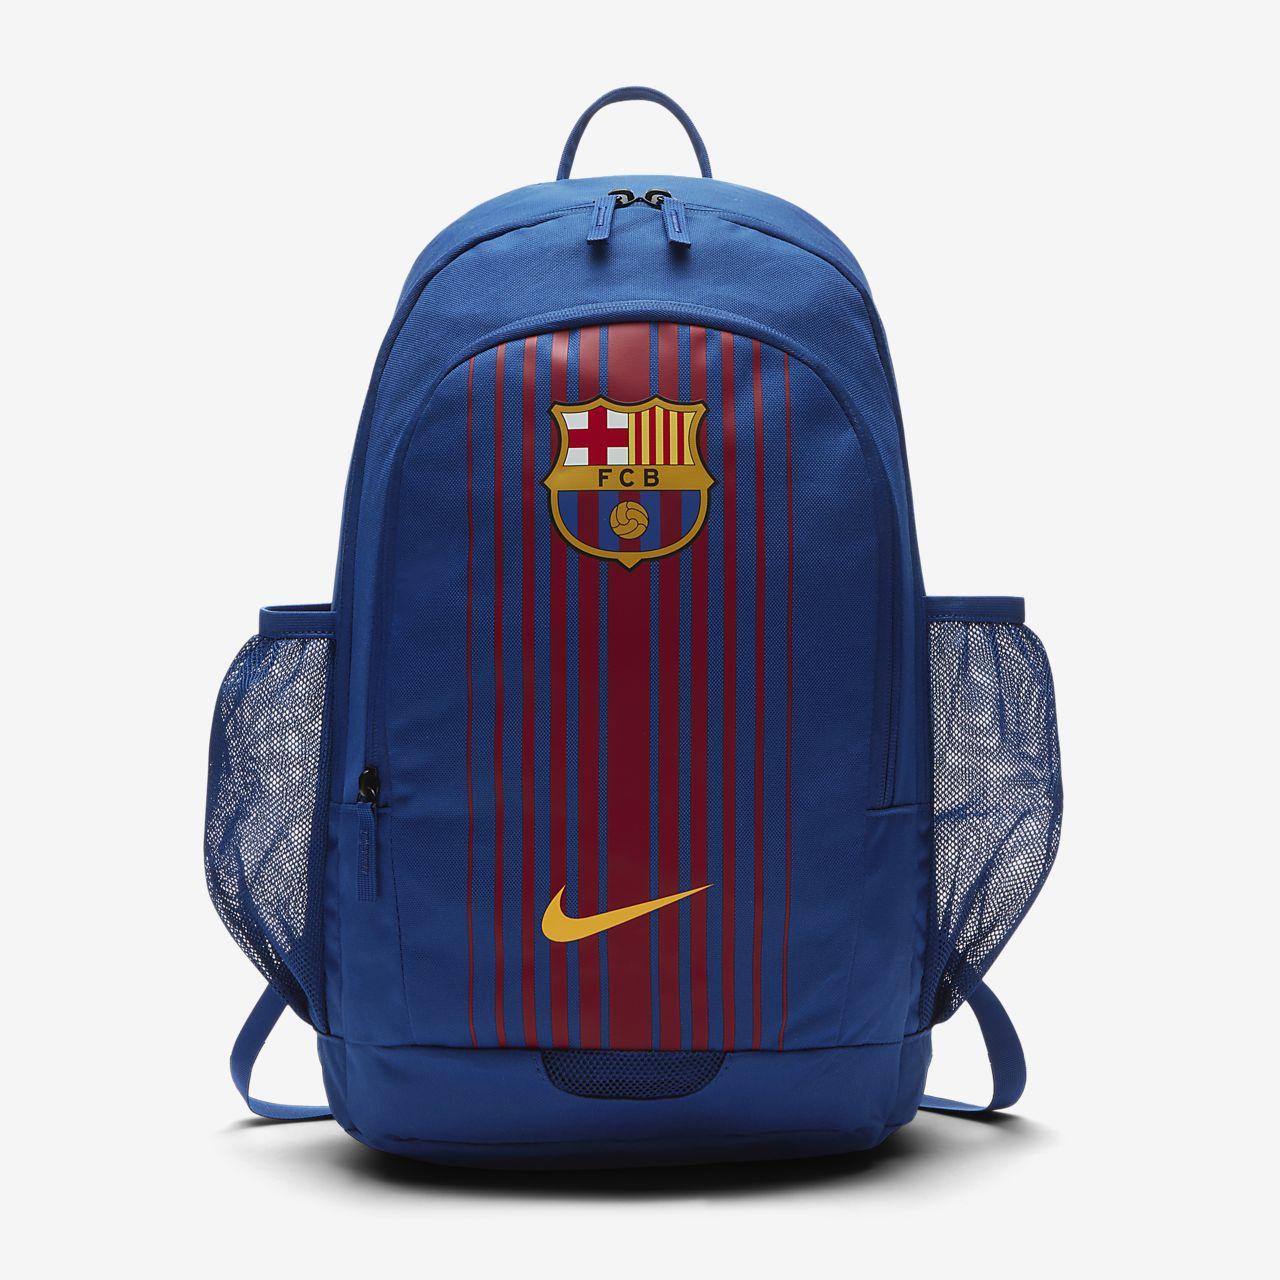 Рюкзак fc barcelona nike рюкзак kellen 1250 kn bufalo blue